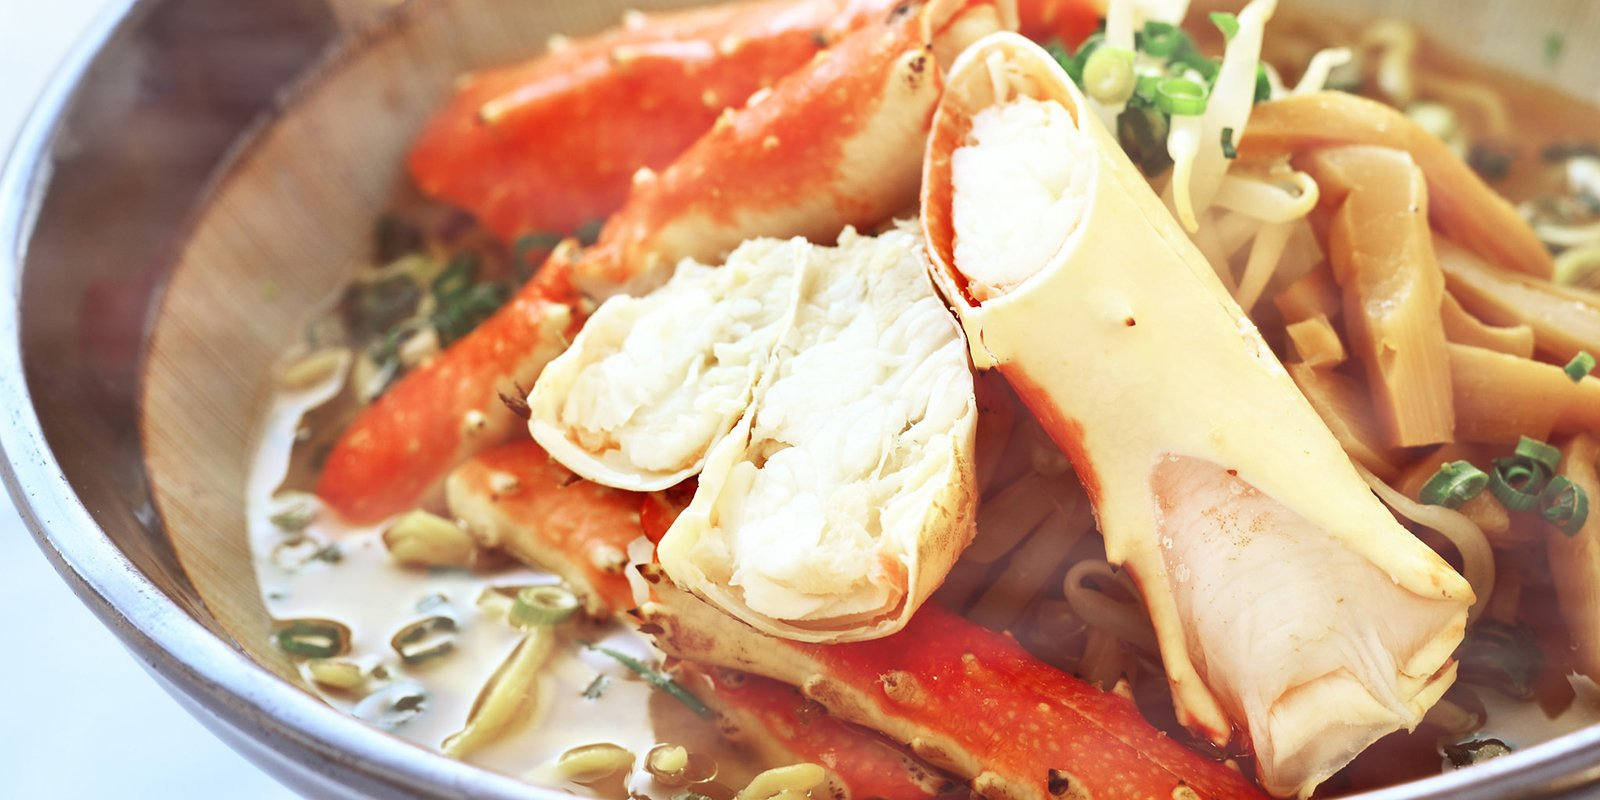 Hanazono 308 crab ramen large